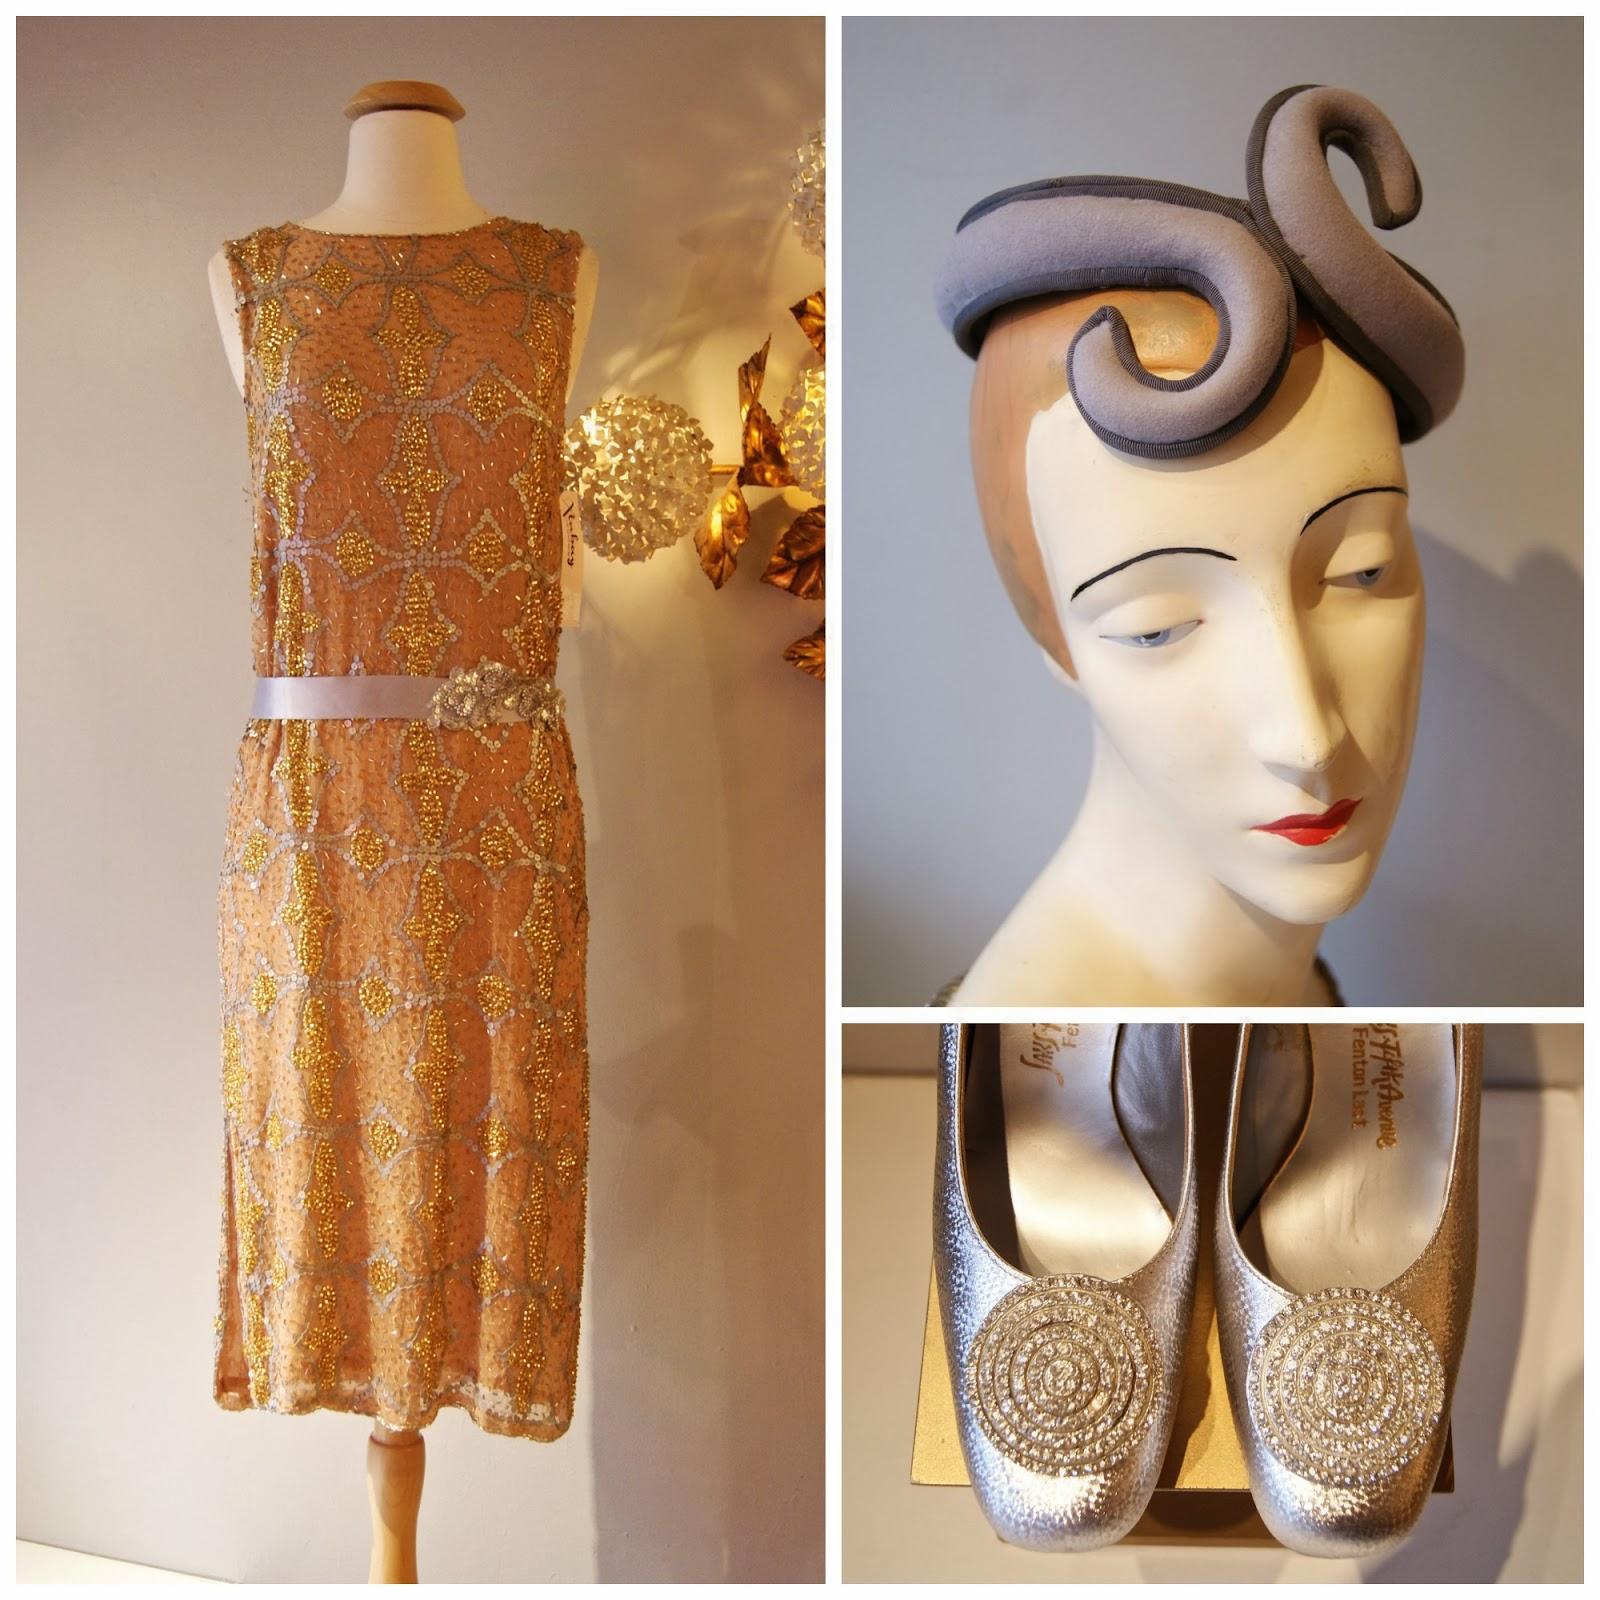 Xtabay Vintage Clothing Boutique - Portland, Oregon: March ...